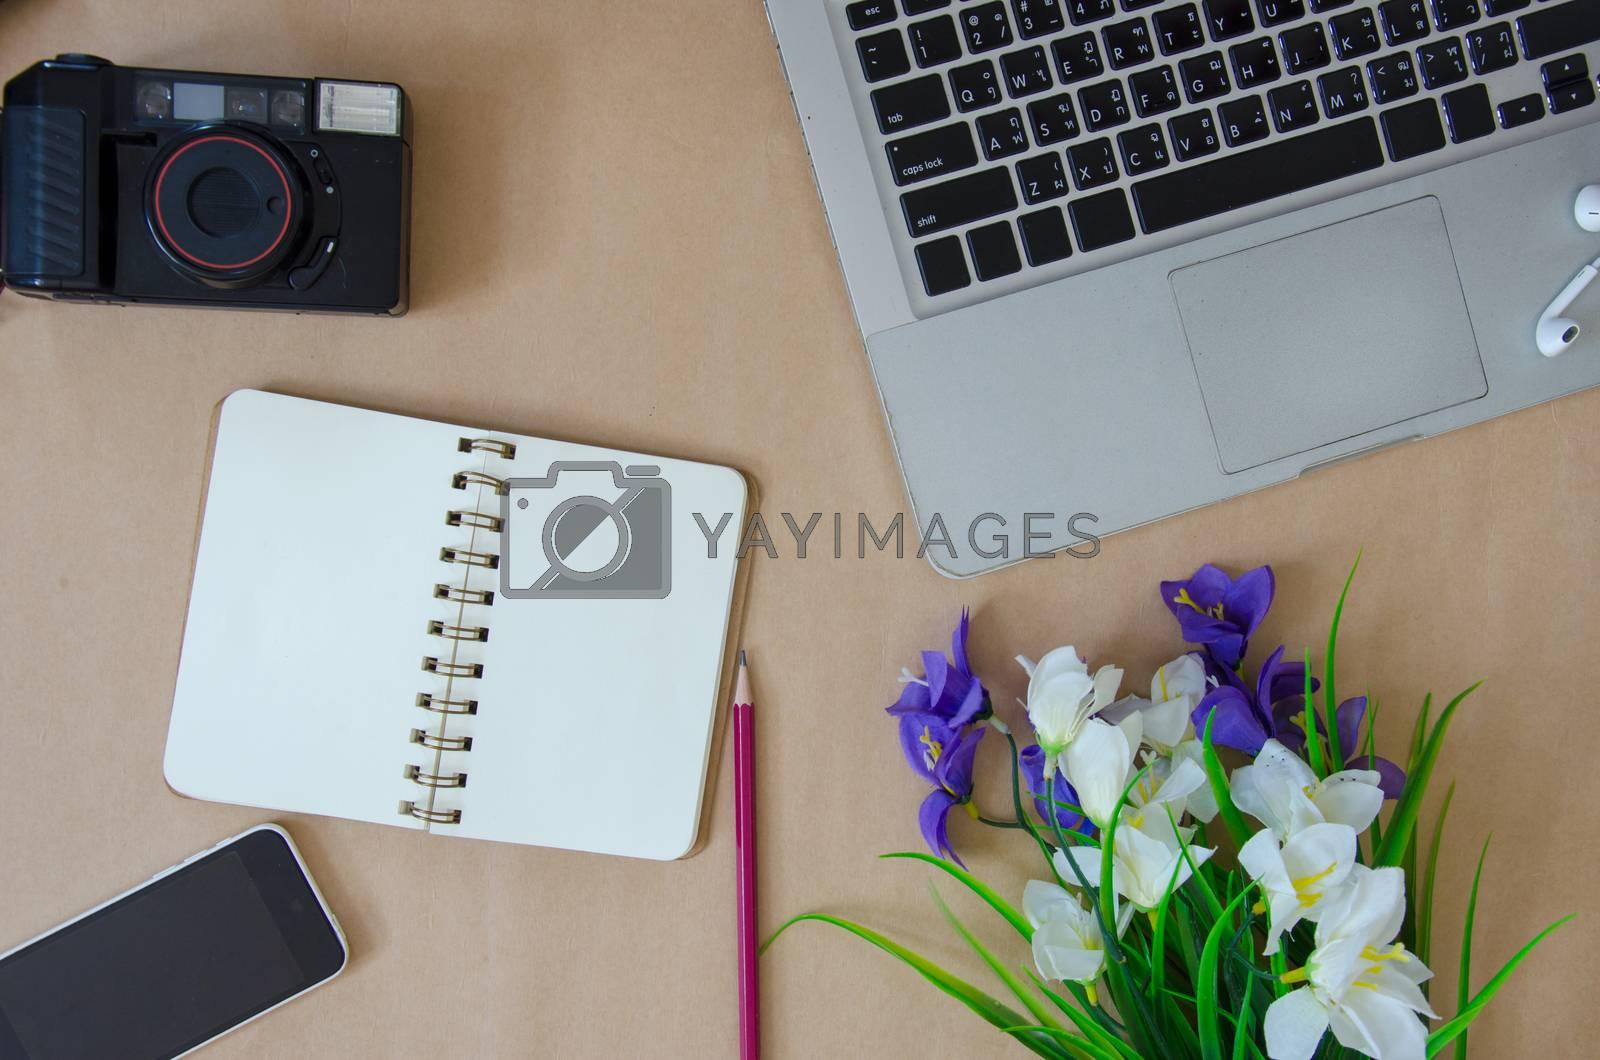 Laptops and smartphone ukulele and purple flowers